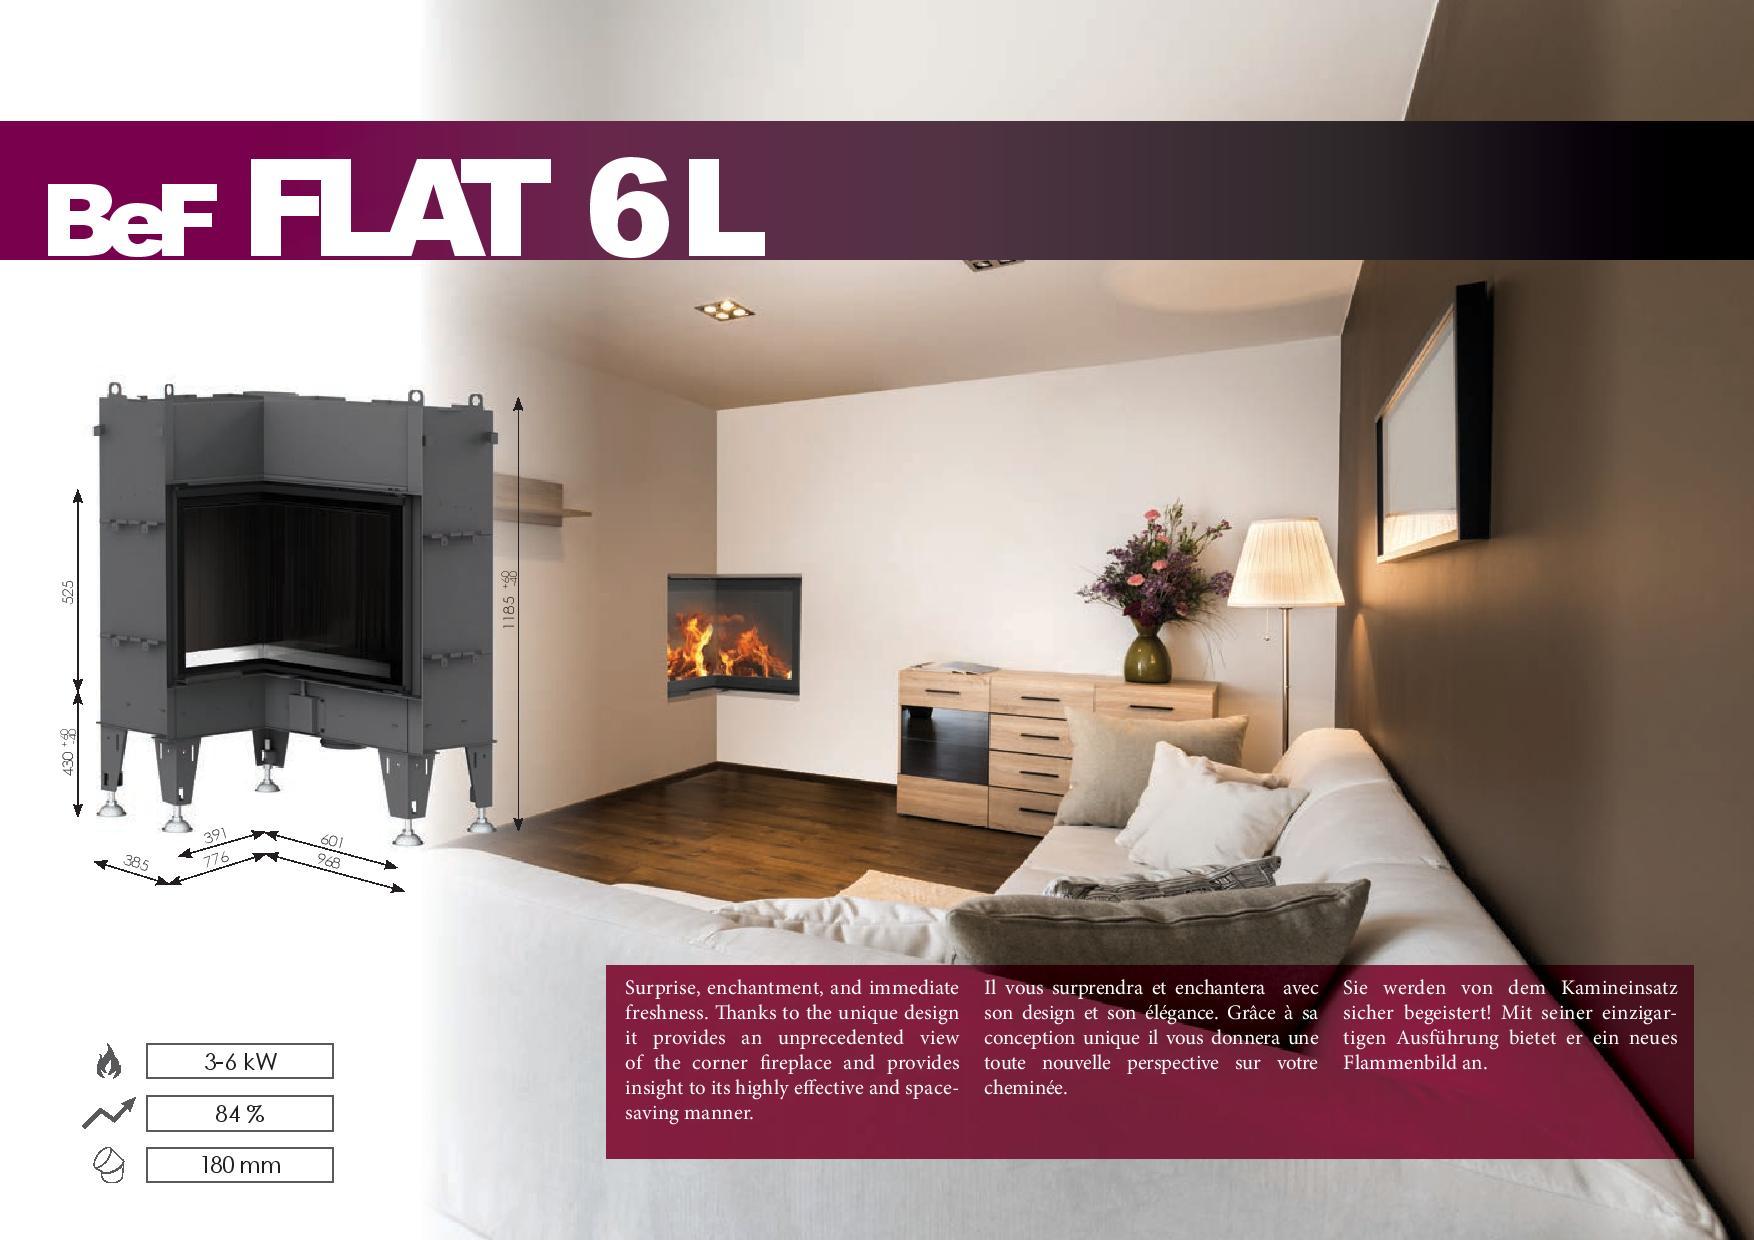 Foyers à bois FLAT BeF HOME 6 kw vitre d'angle rentrant